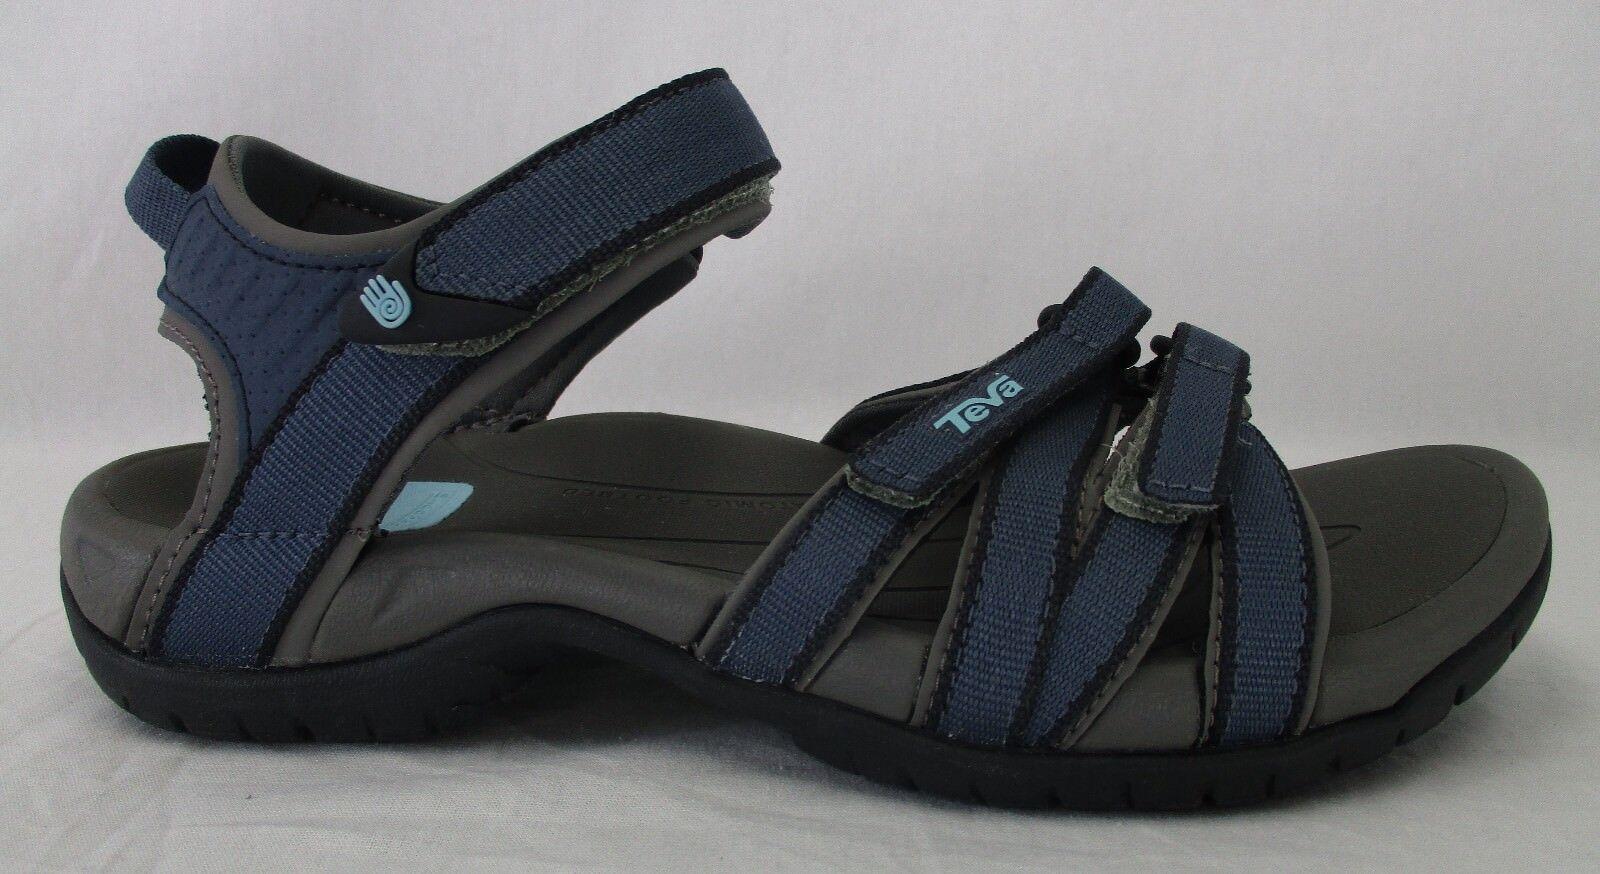 Teva Womens Tirra Sandals 4266 Bering Sea Size 8